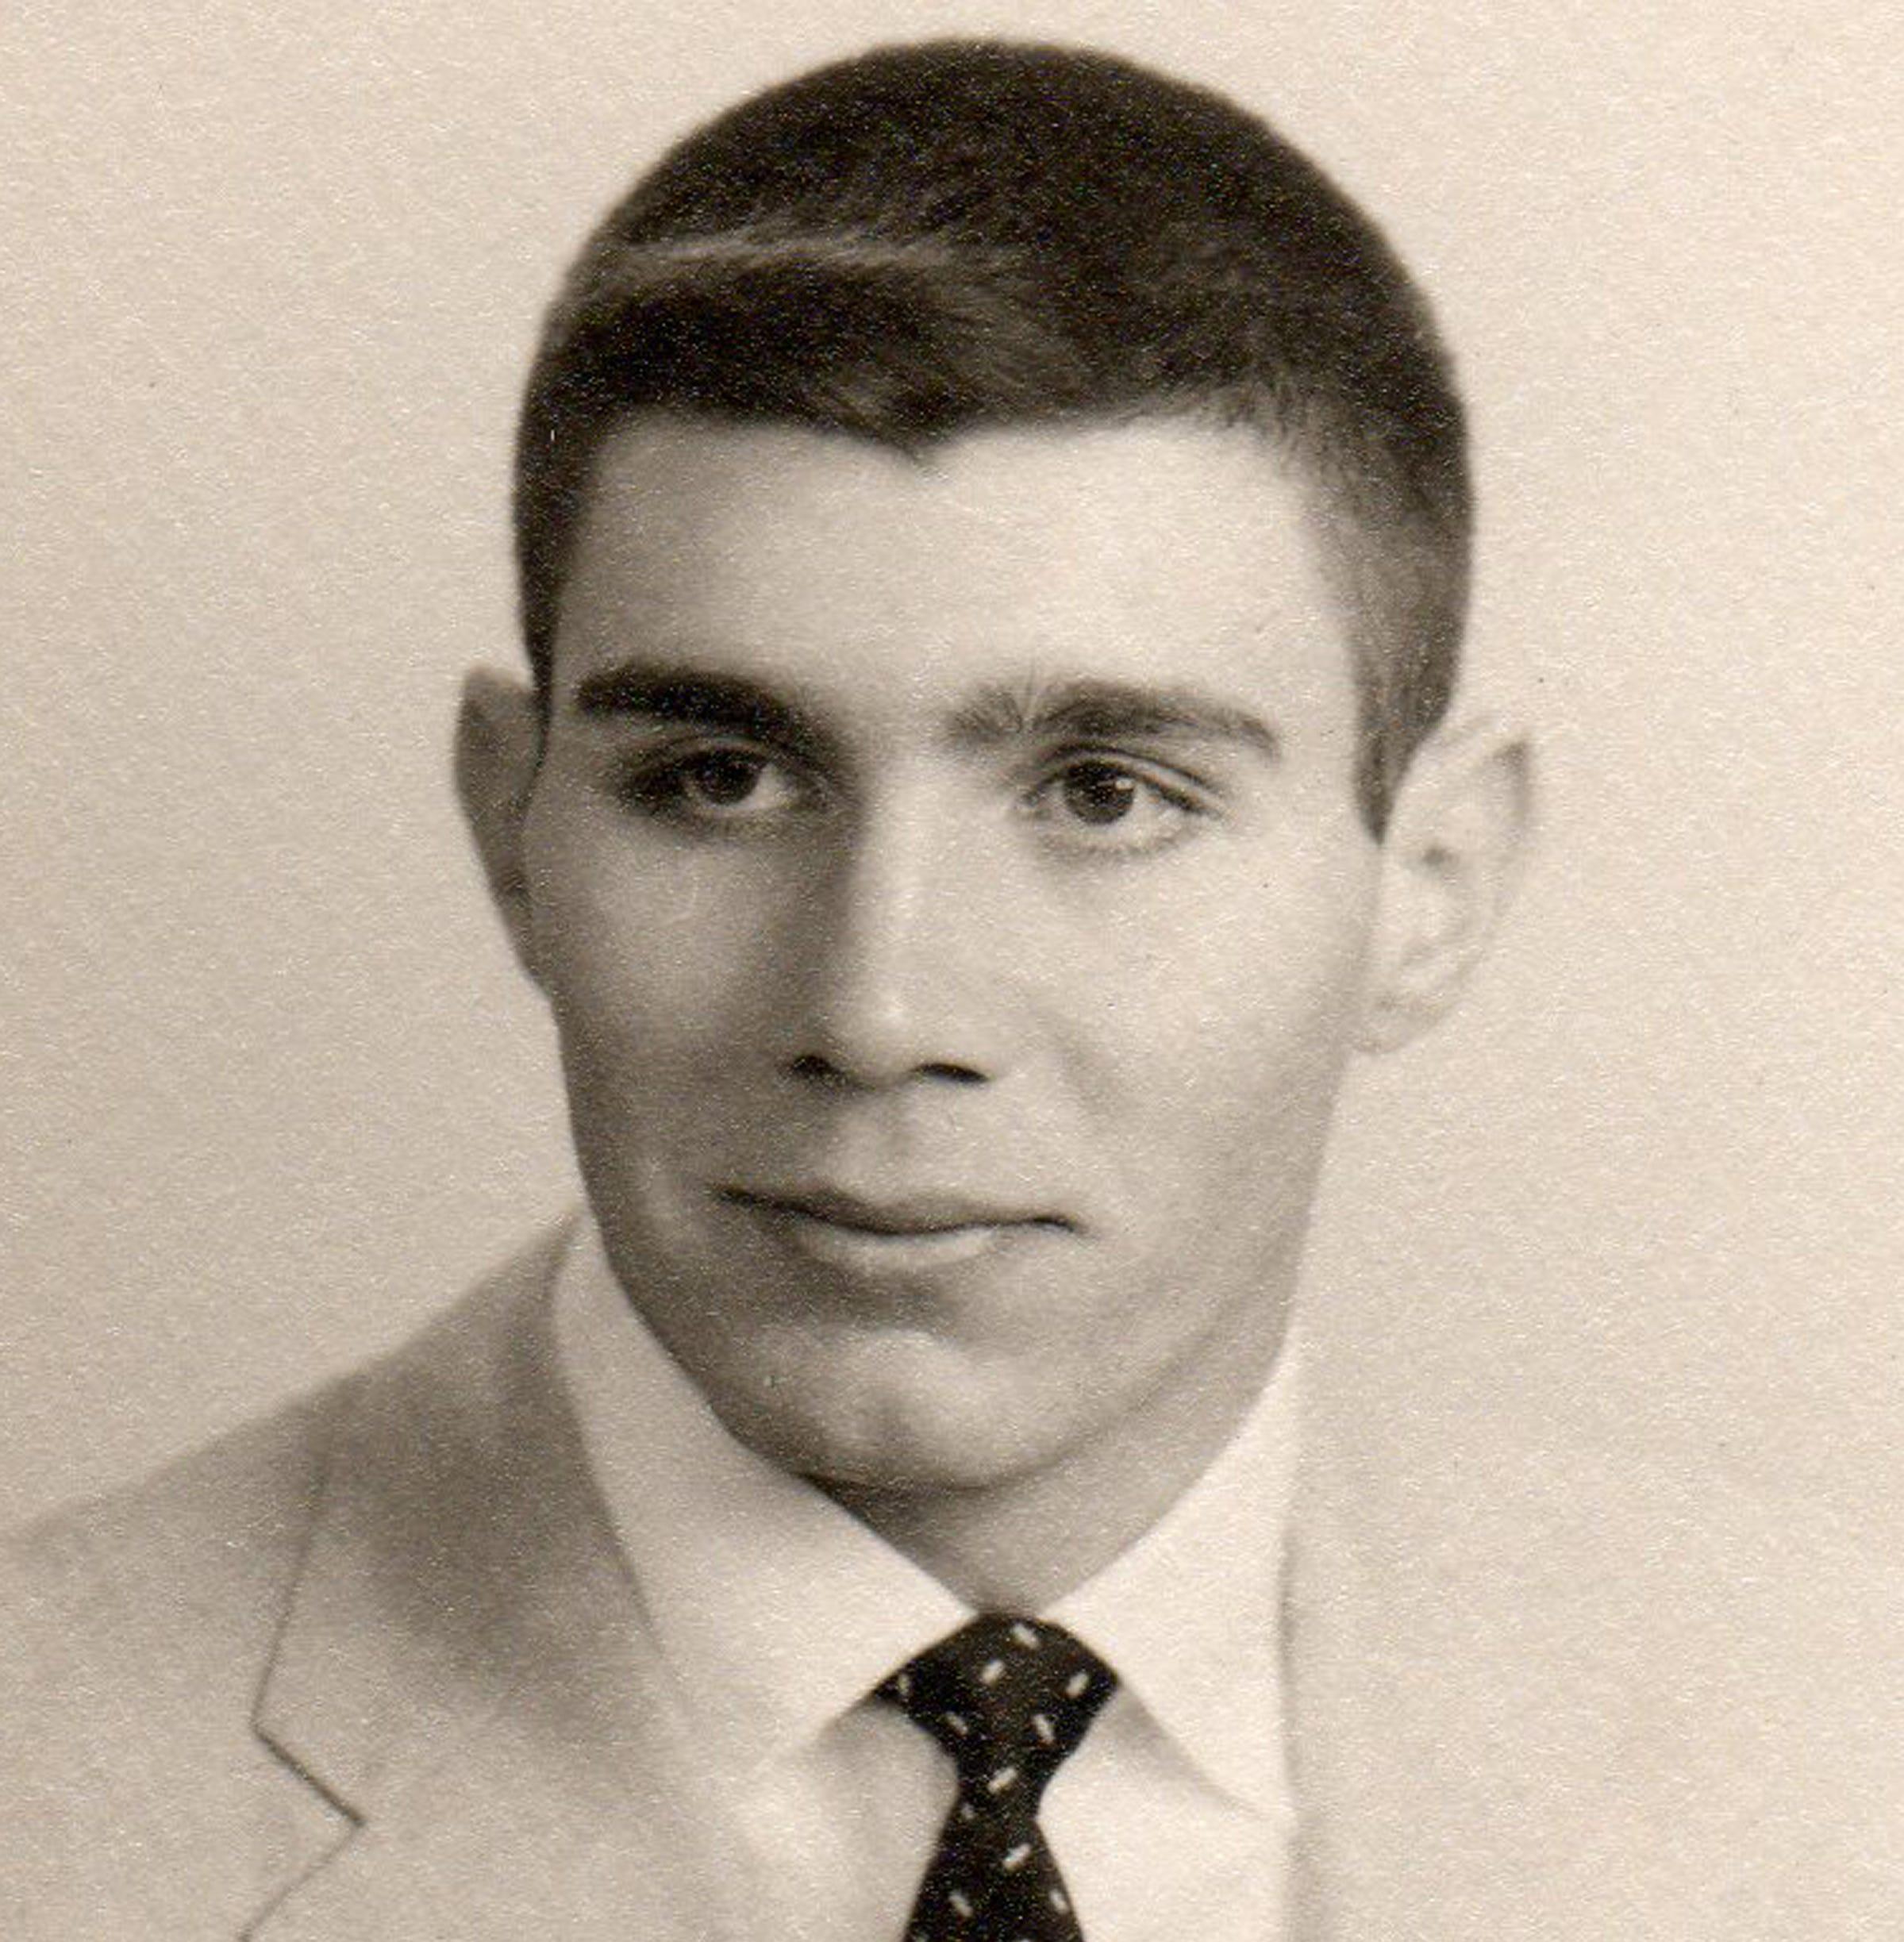 Fredrick patriarch had significant impact on Greater Cincinnati high school sports